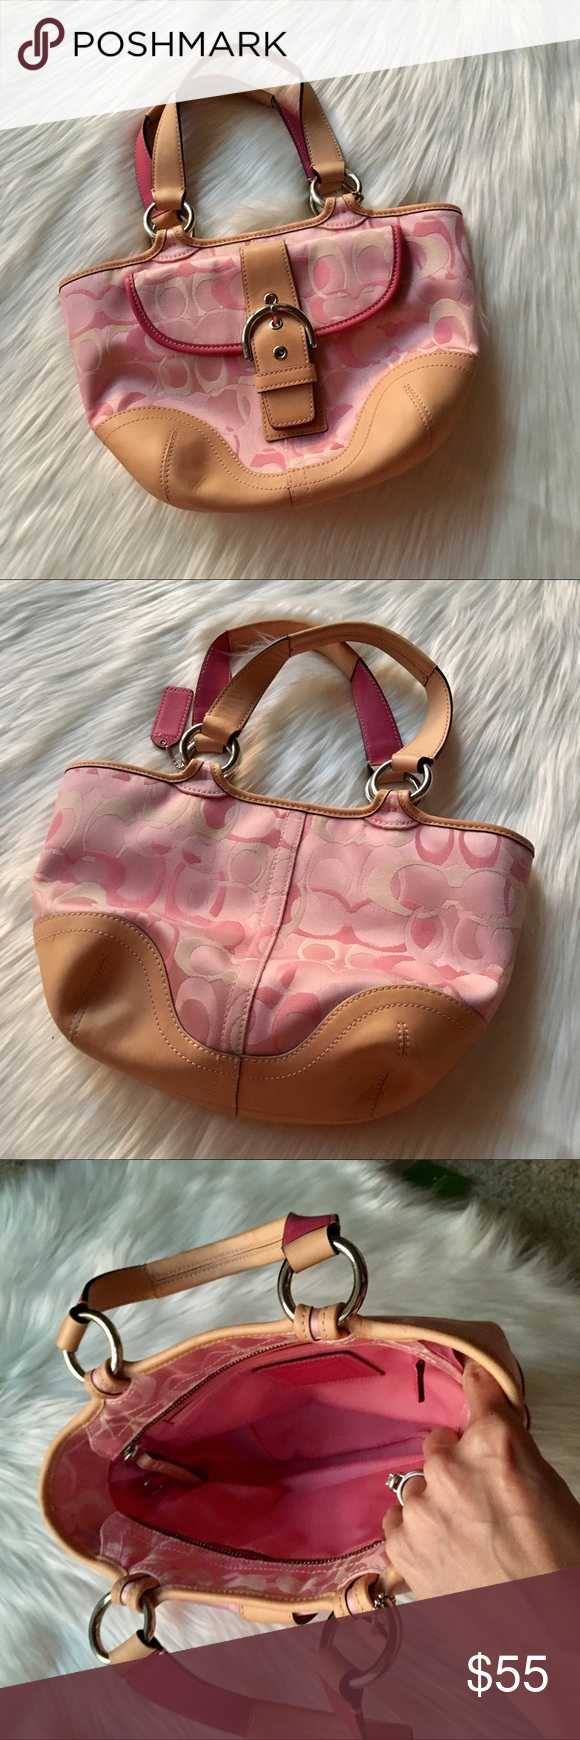 57a2b1bec71 Coach Small Pink Signature Purse. Pink PursesTan LeatherCoach BagsAnd ...